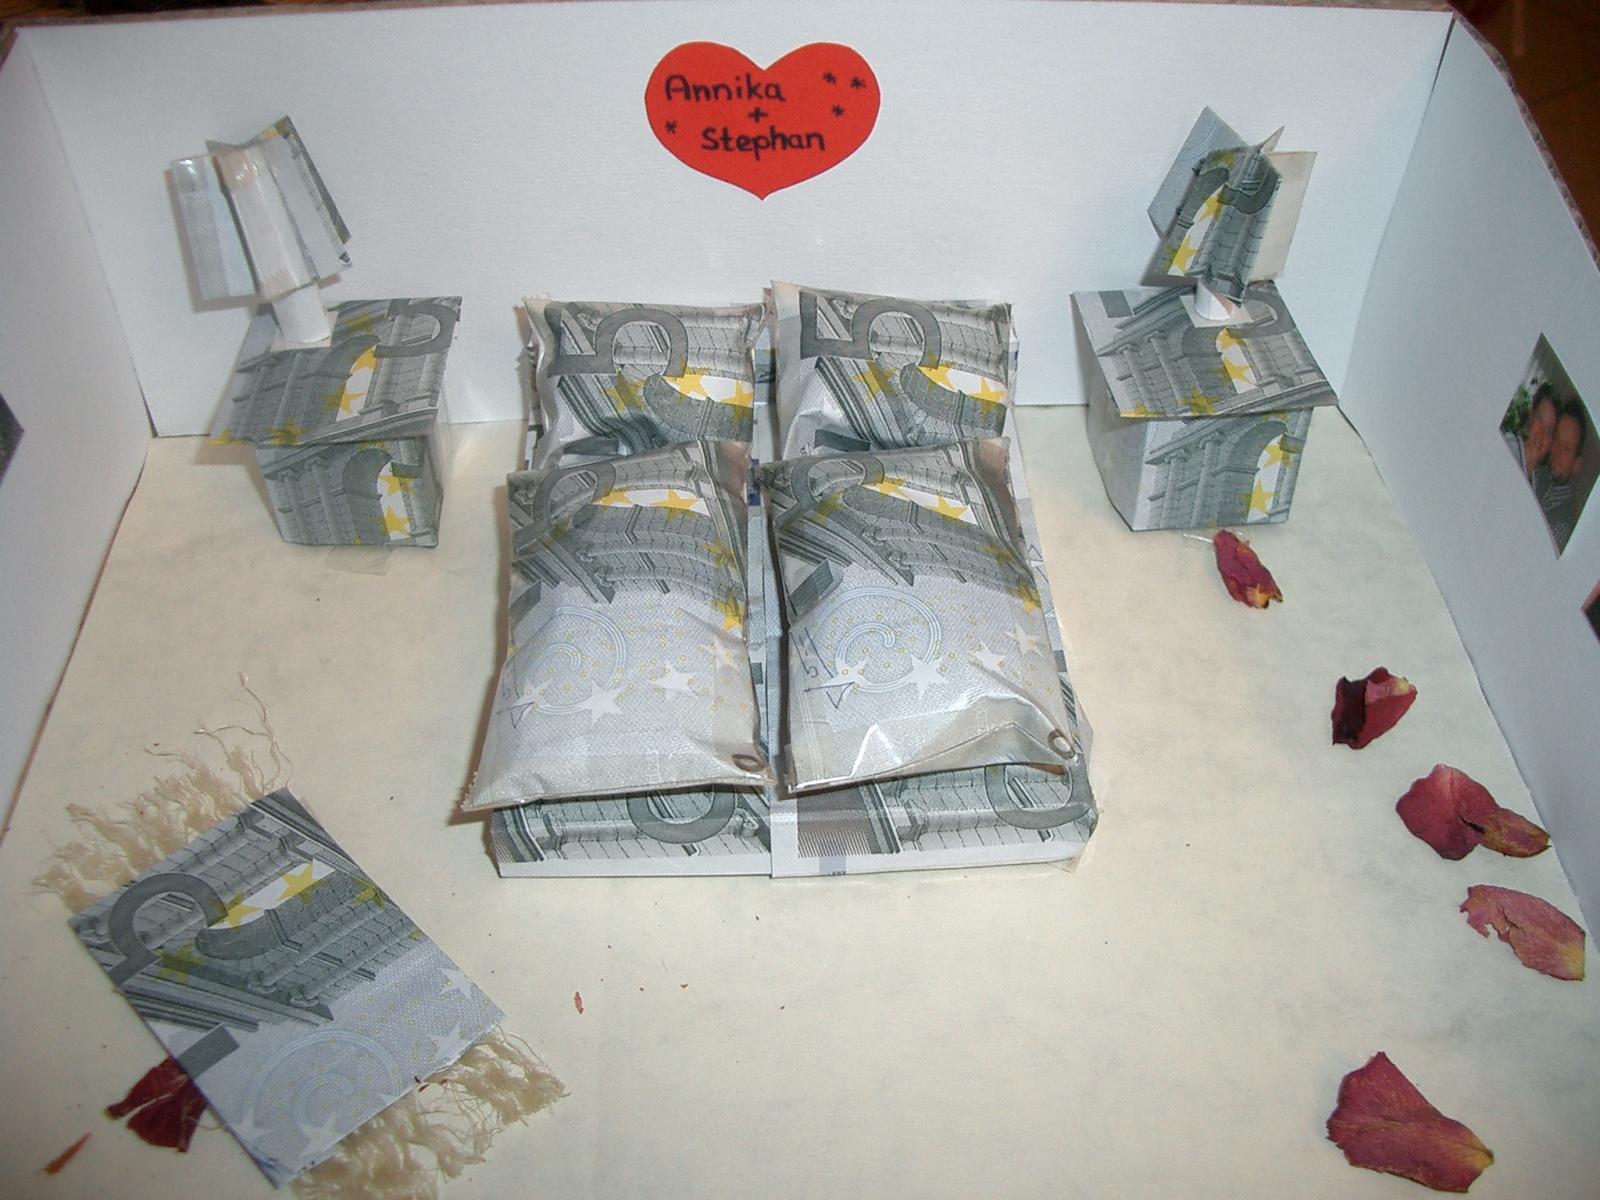 Schlafzimmer Aus Geld Basteln : Fandi: Esküvői handmade ajándékok